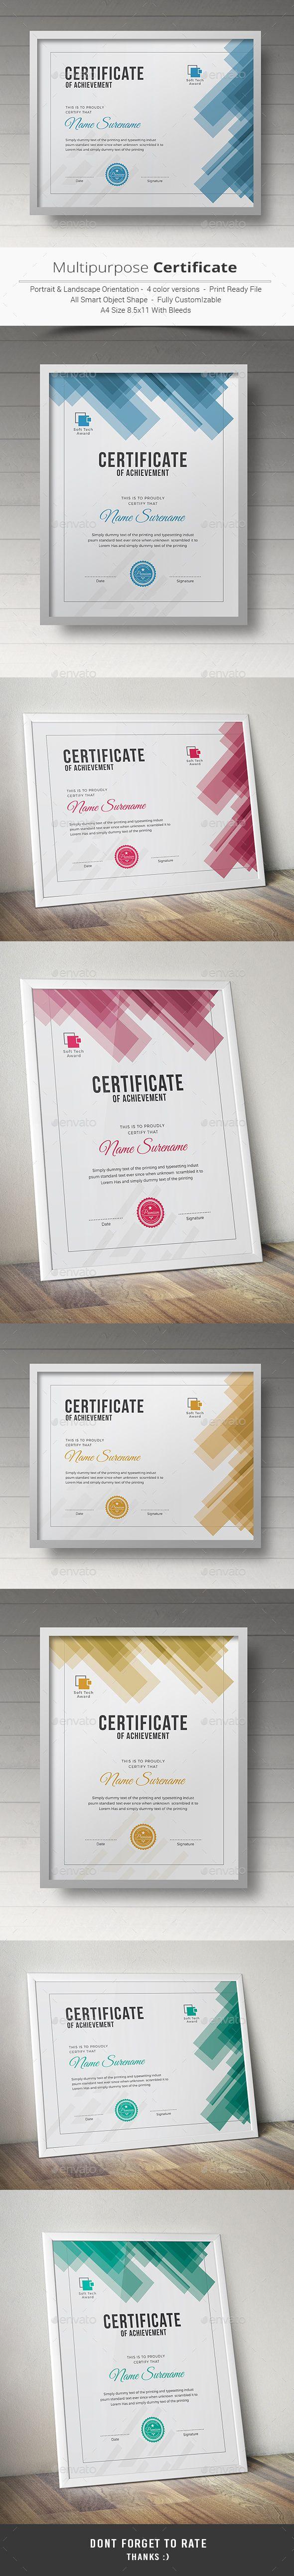 Certificate Template PSD. Download here: https://graphicriver.net/item/certificate/17623701?ref=ksioks